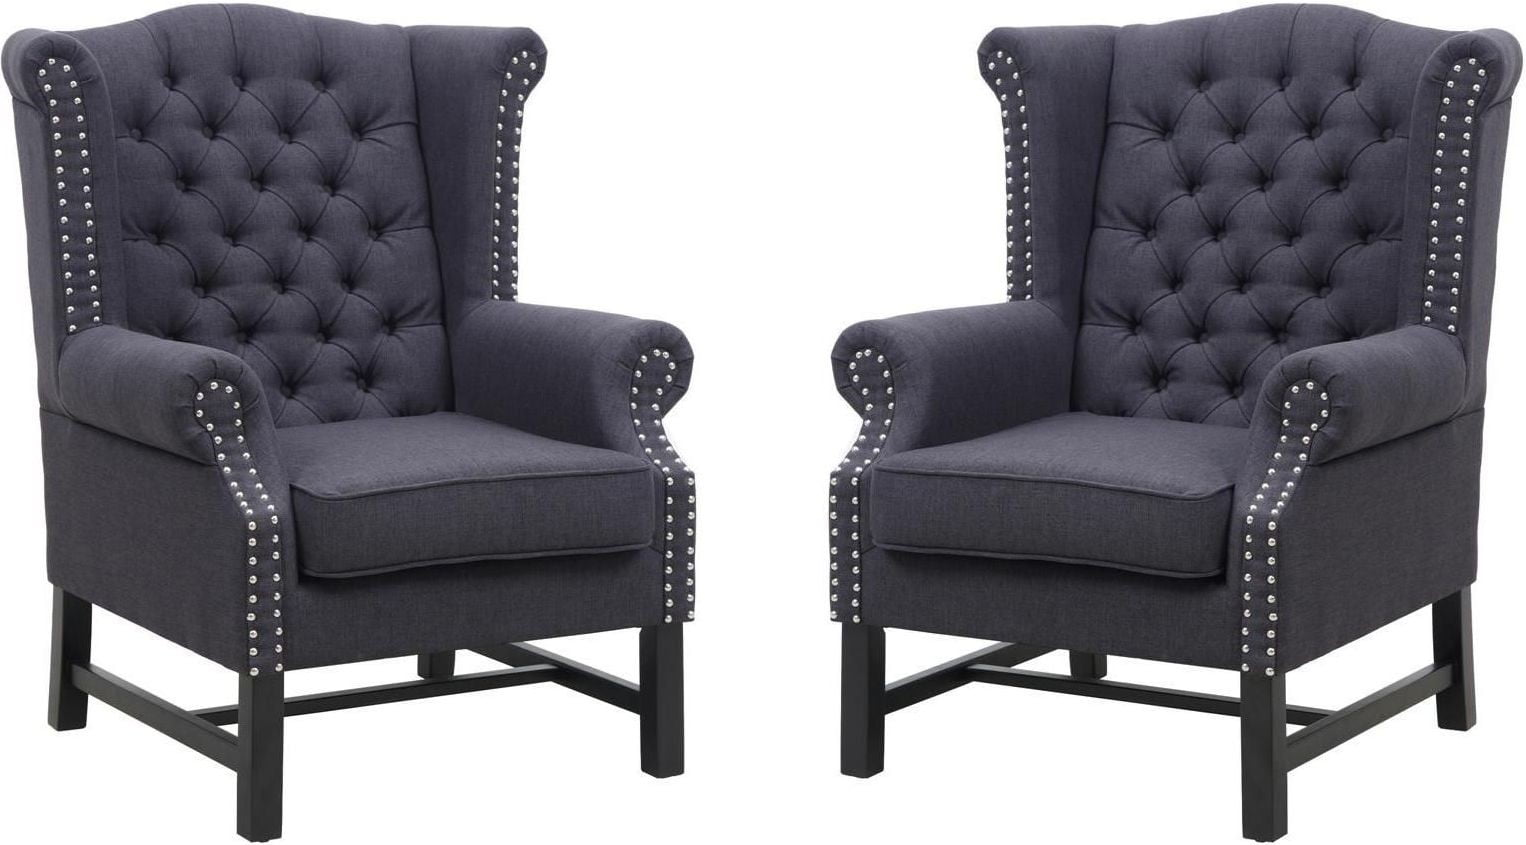 grey club chair high back go anywhere fairfield linen from tov 63102